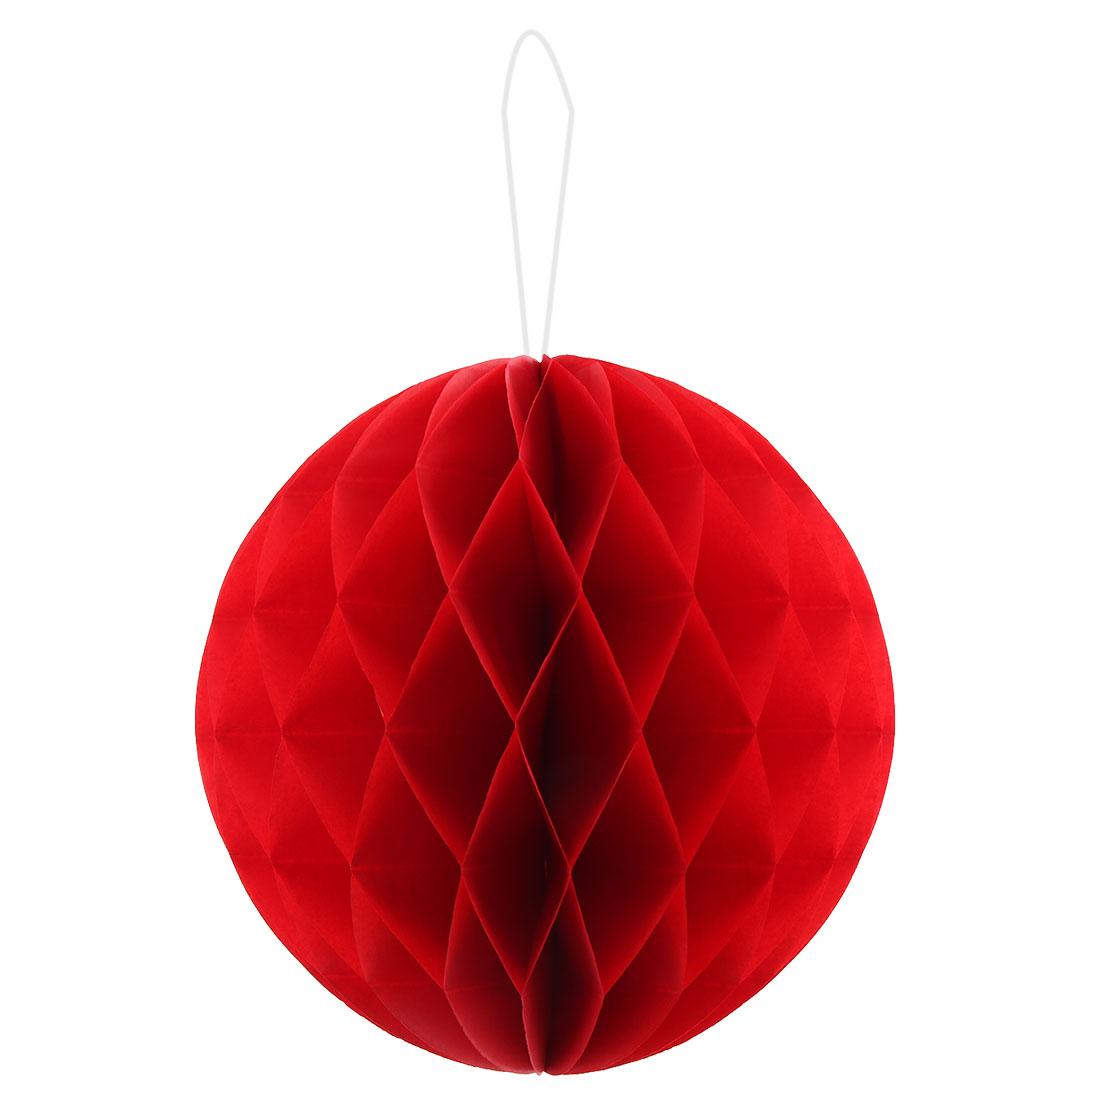 Paper Foldable DIY String Hanging Lantern Lamp Decor Honeycomb Ball Red 12 Inch Dia